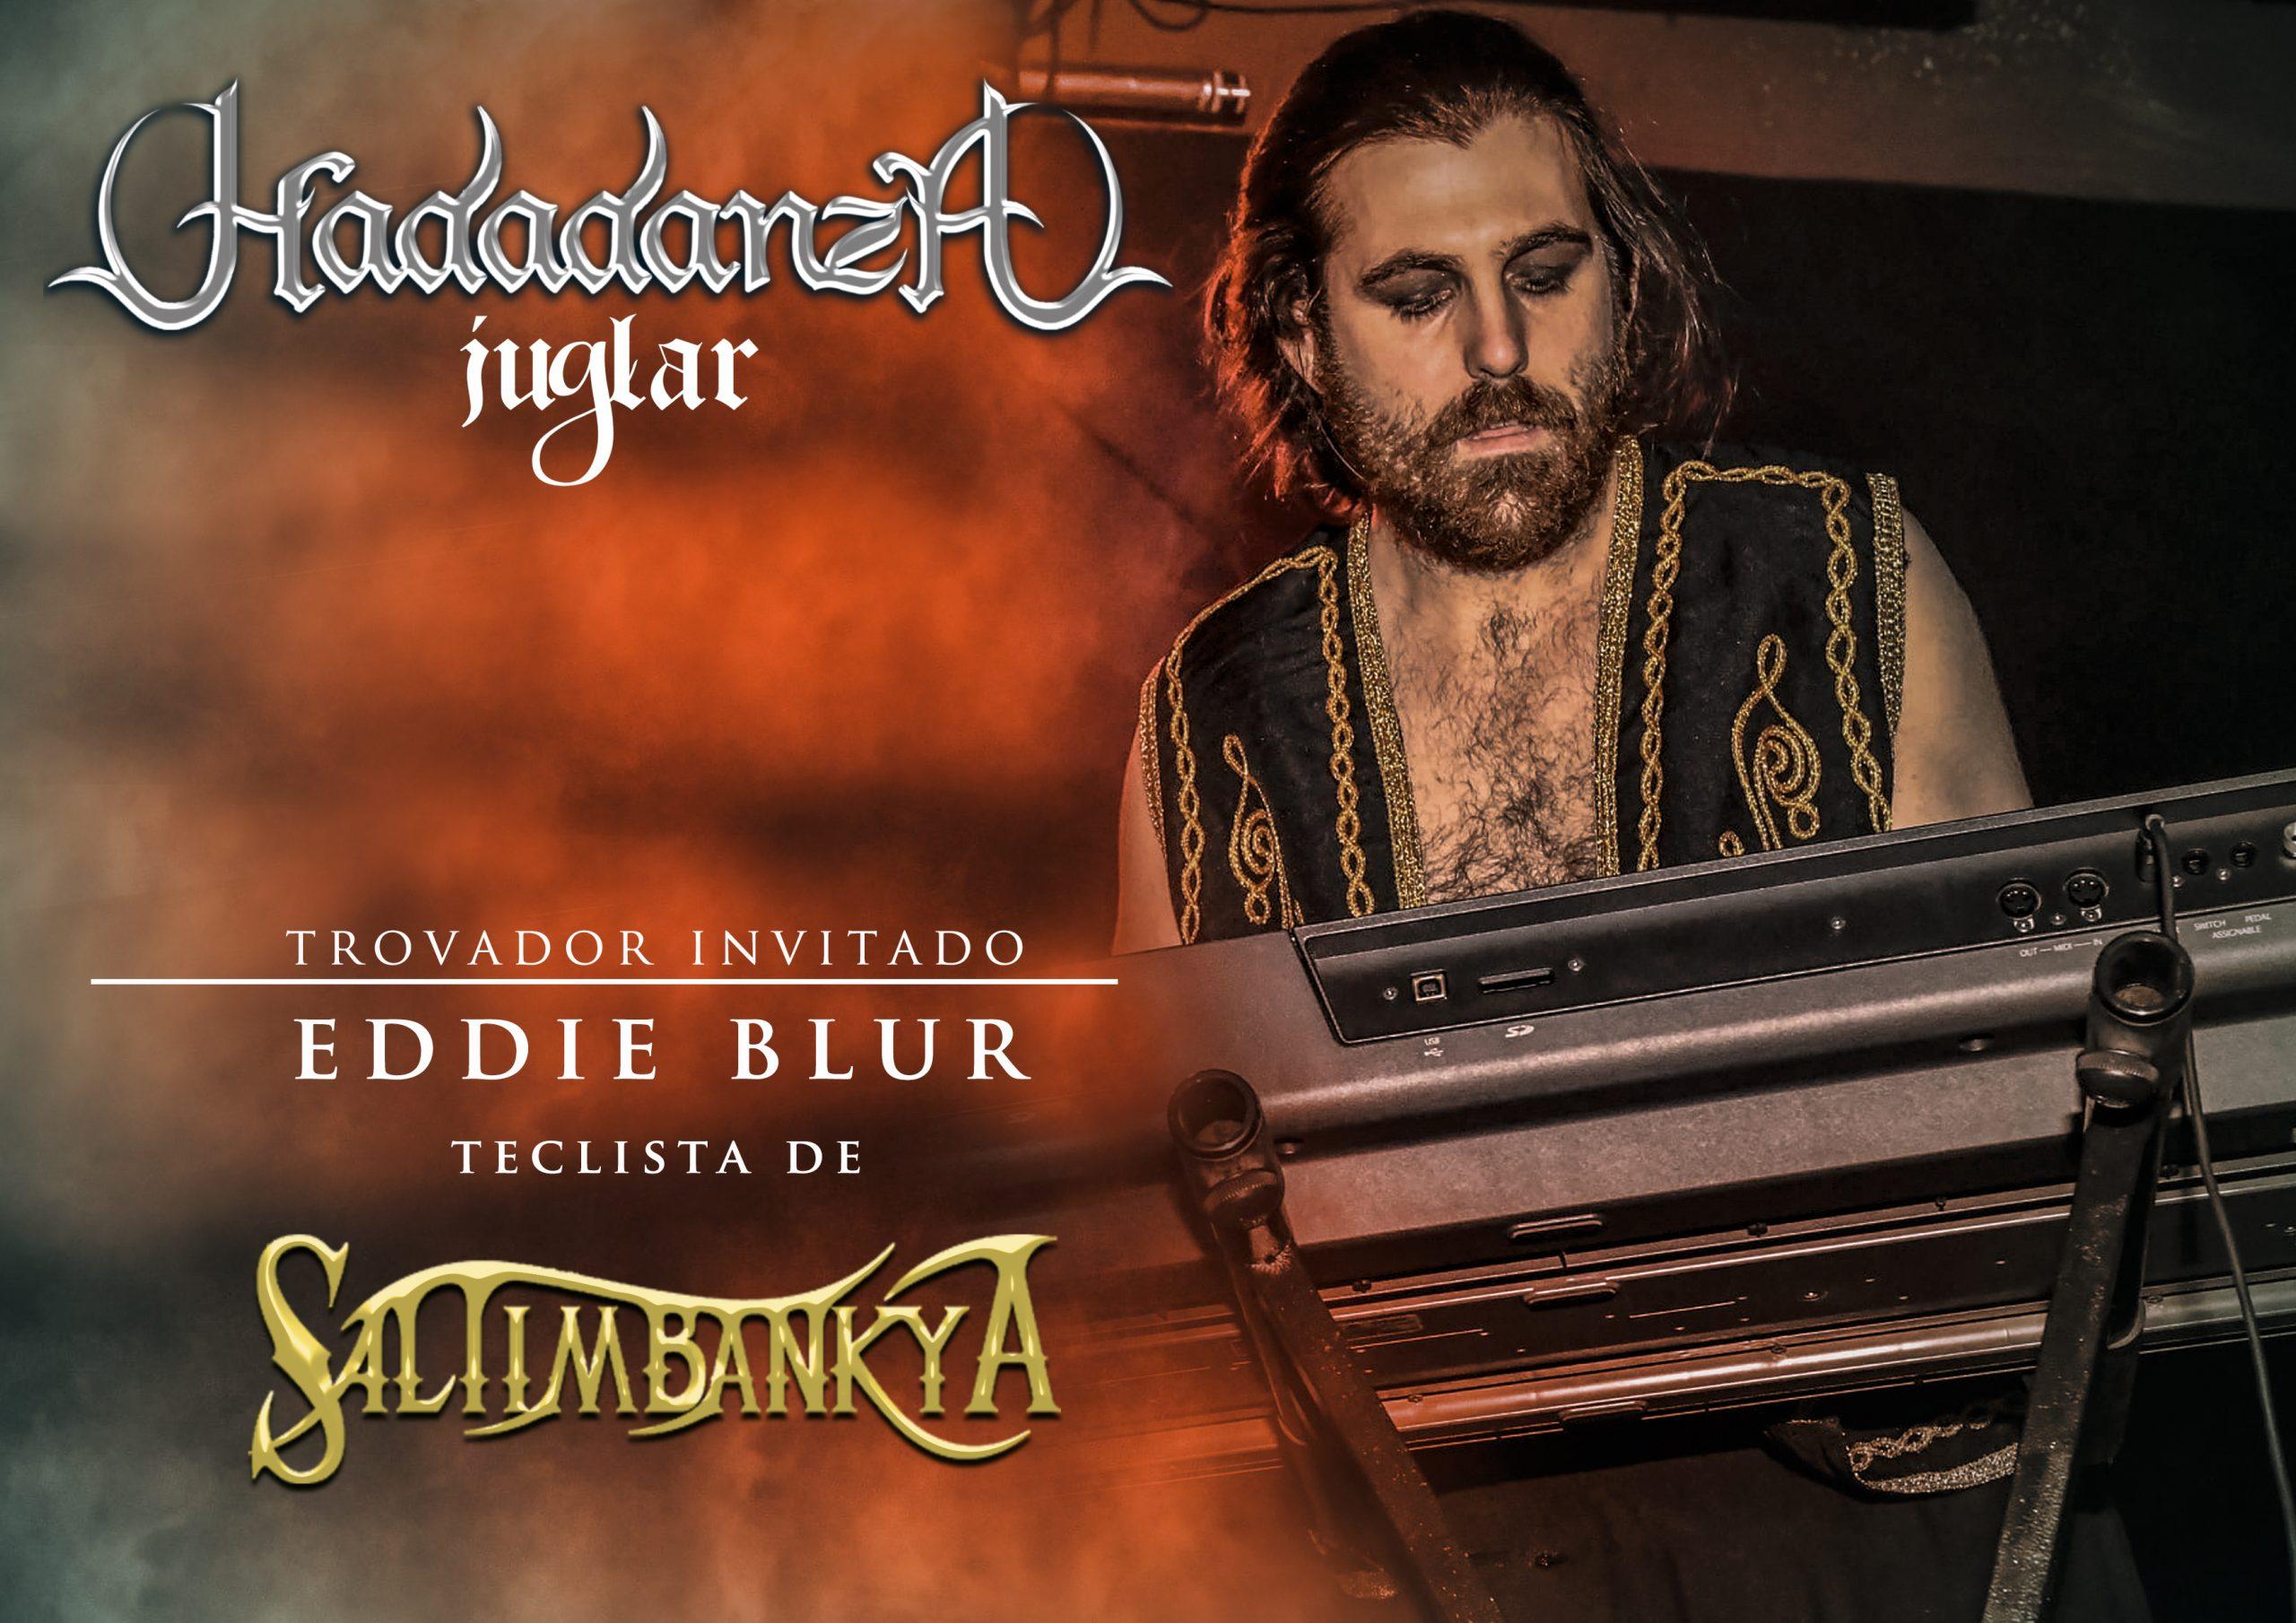 FOLK METAL ROCK - EDDIE BLUR EN JUGLAR